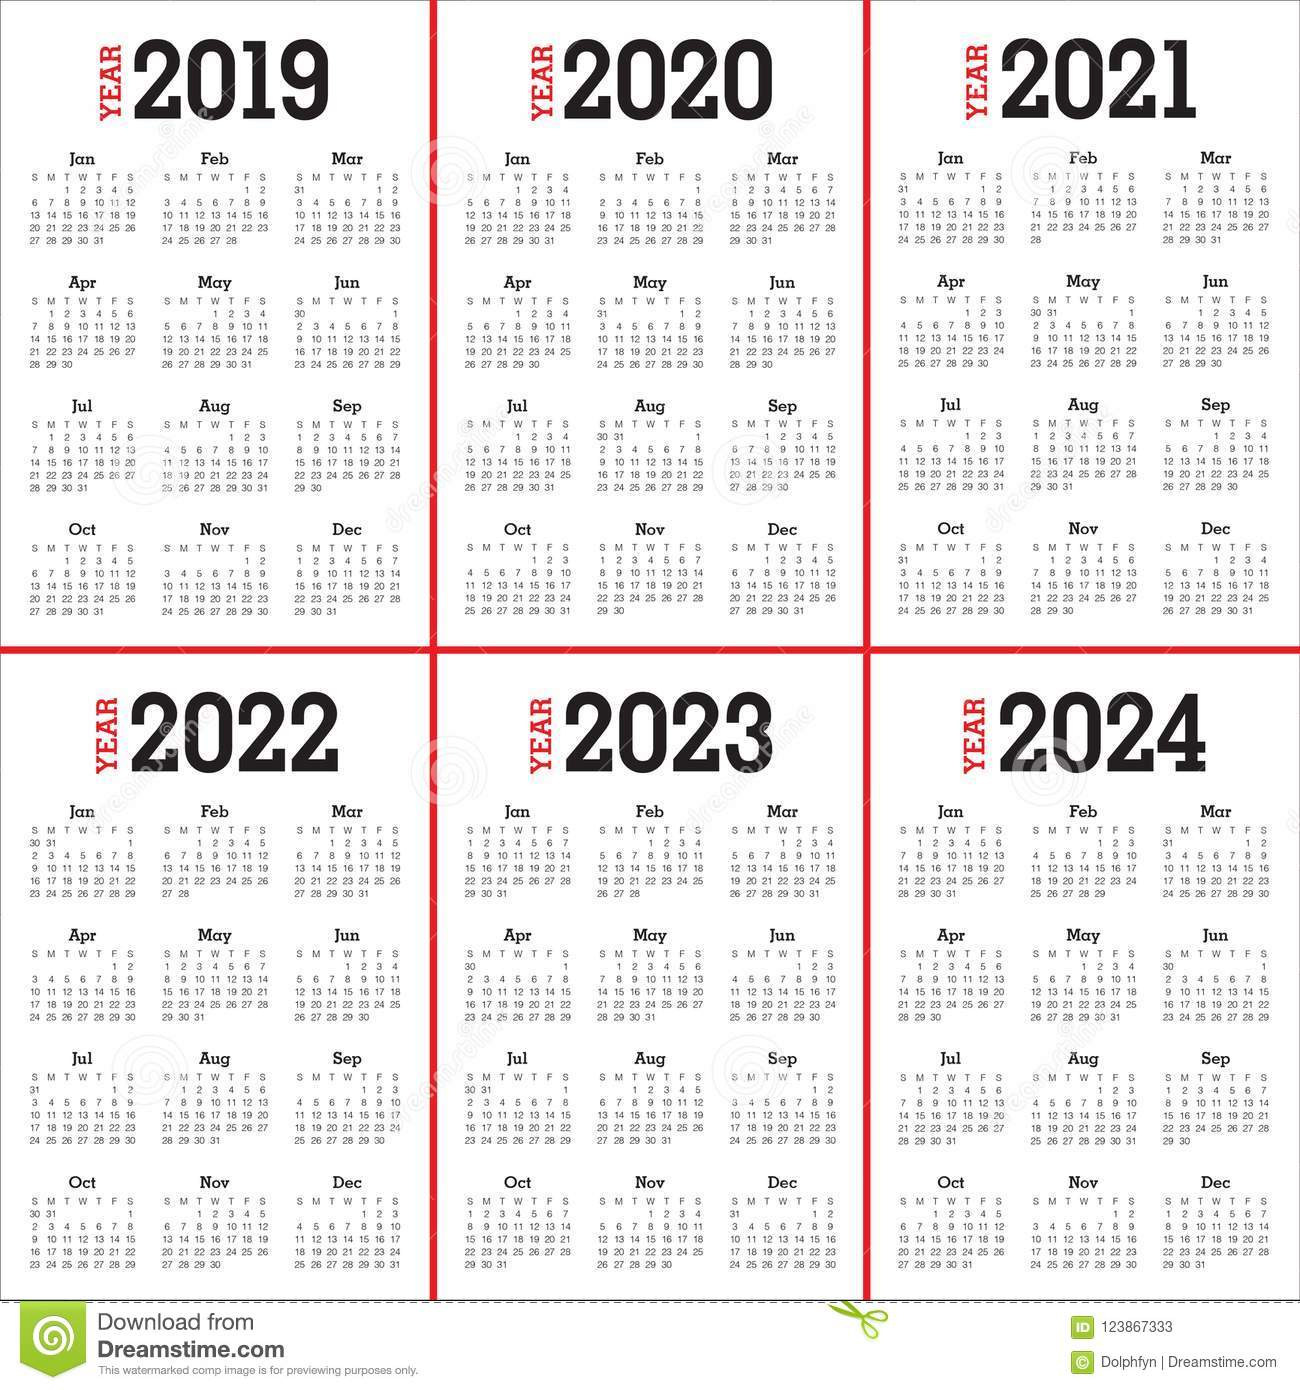 Year 2019 2020 2021 2022 2023 2024 Calendar Vector Design intended for 3 Year Calendar 2020 To 2023